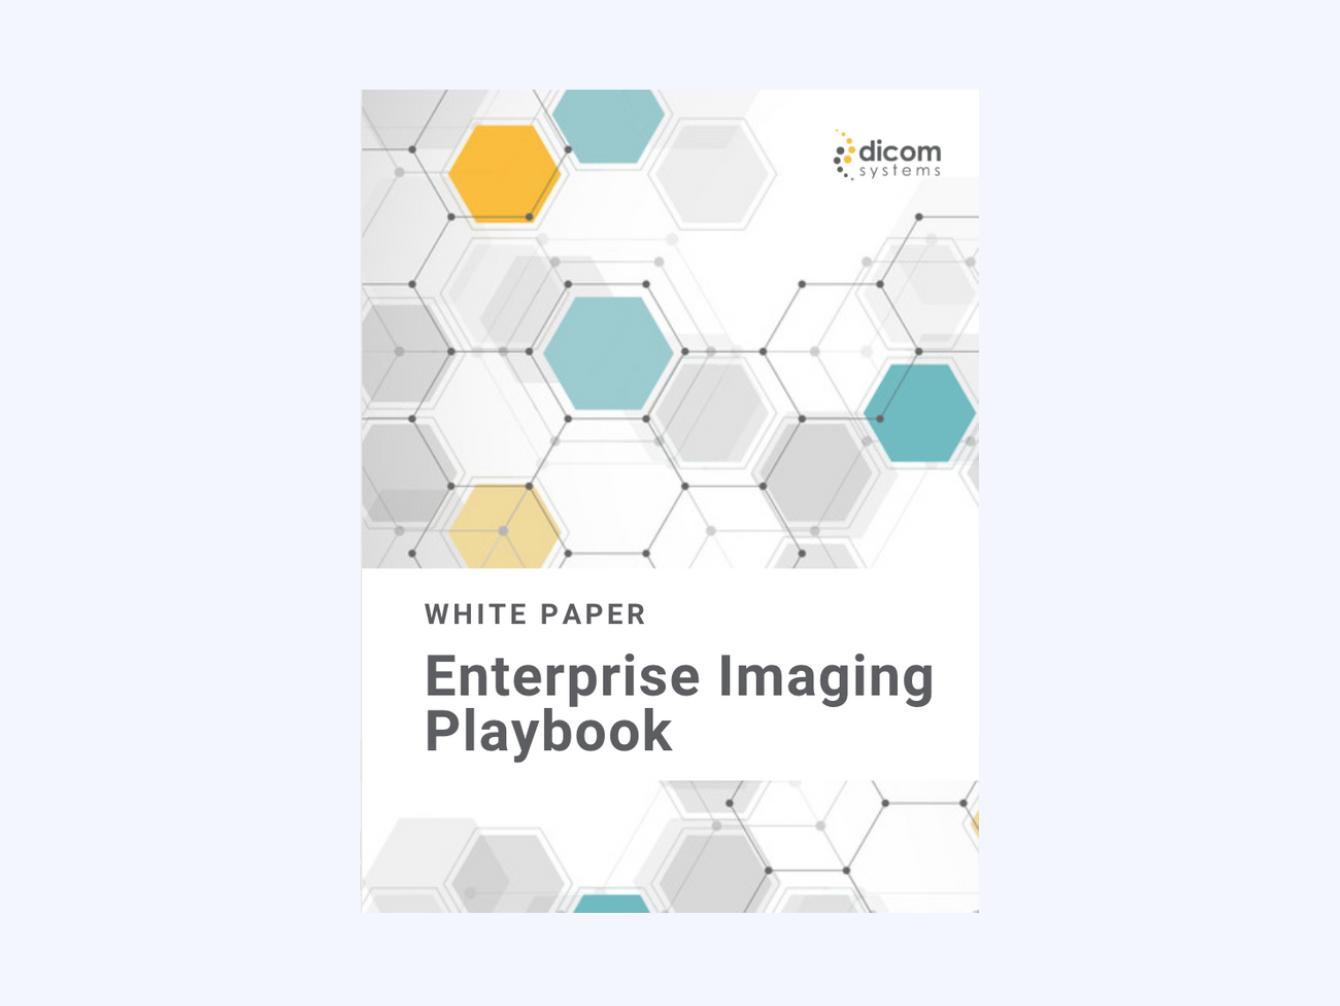 Enterprise Imaging Playbook